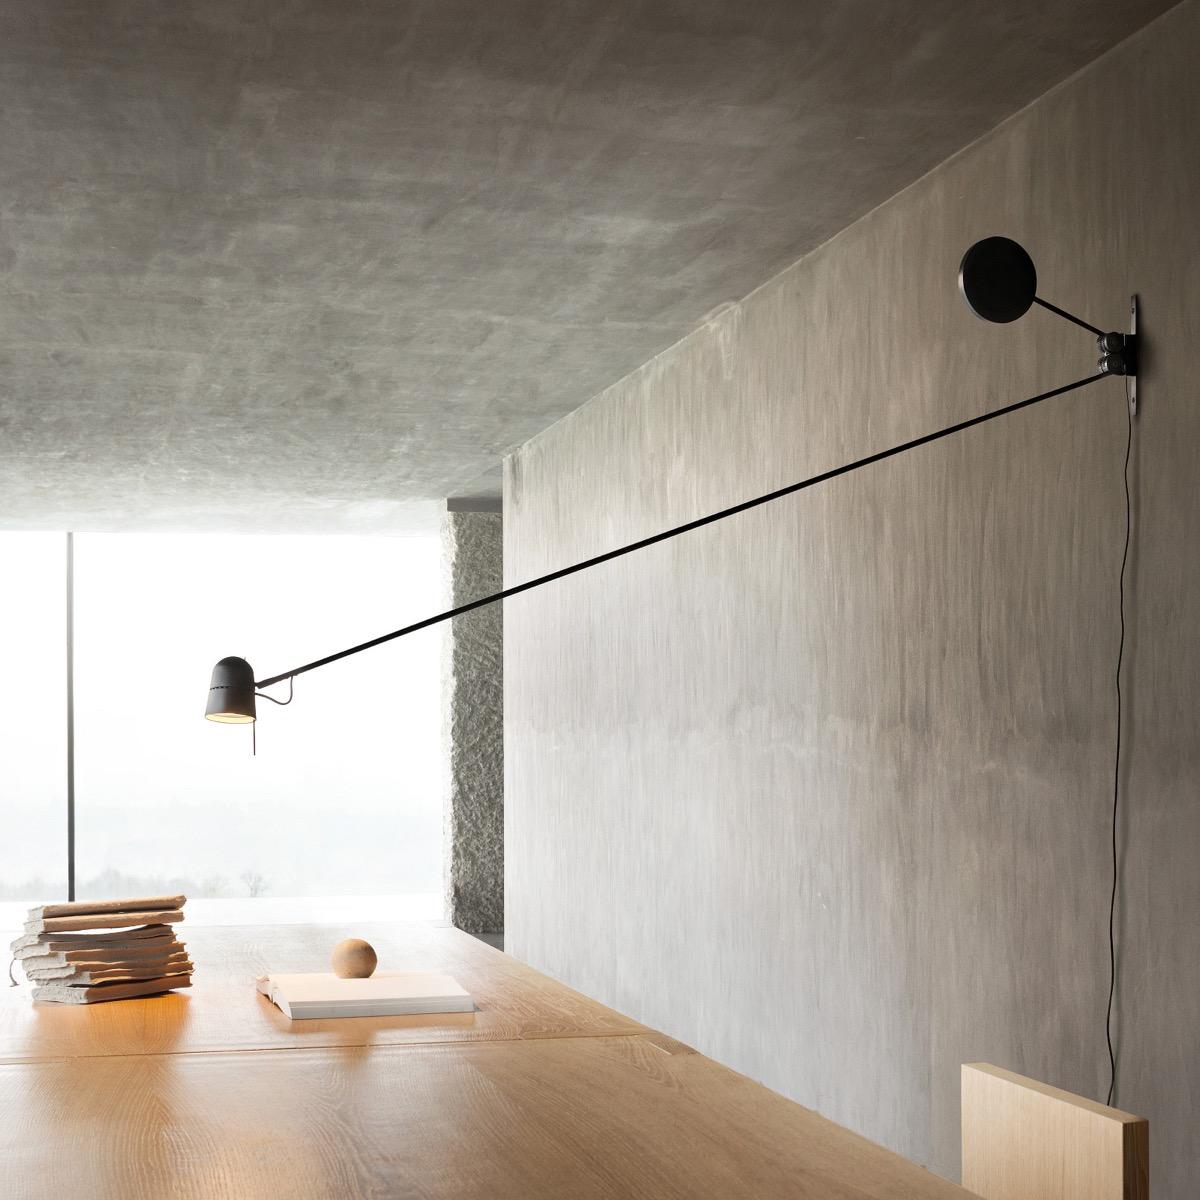 Counterbalance-Swing-Arm-LED-Wall-Light-Black-Metal-Long-Arm-Mountable